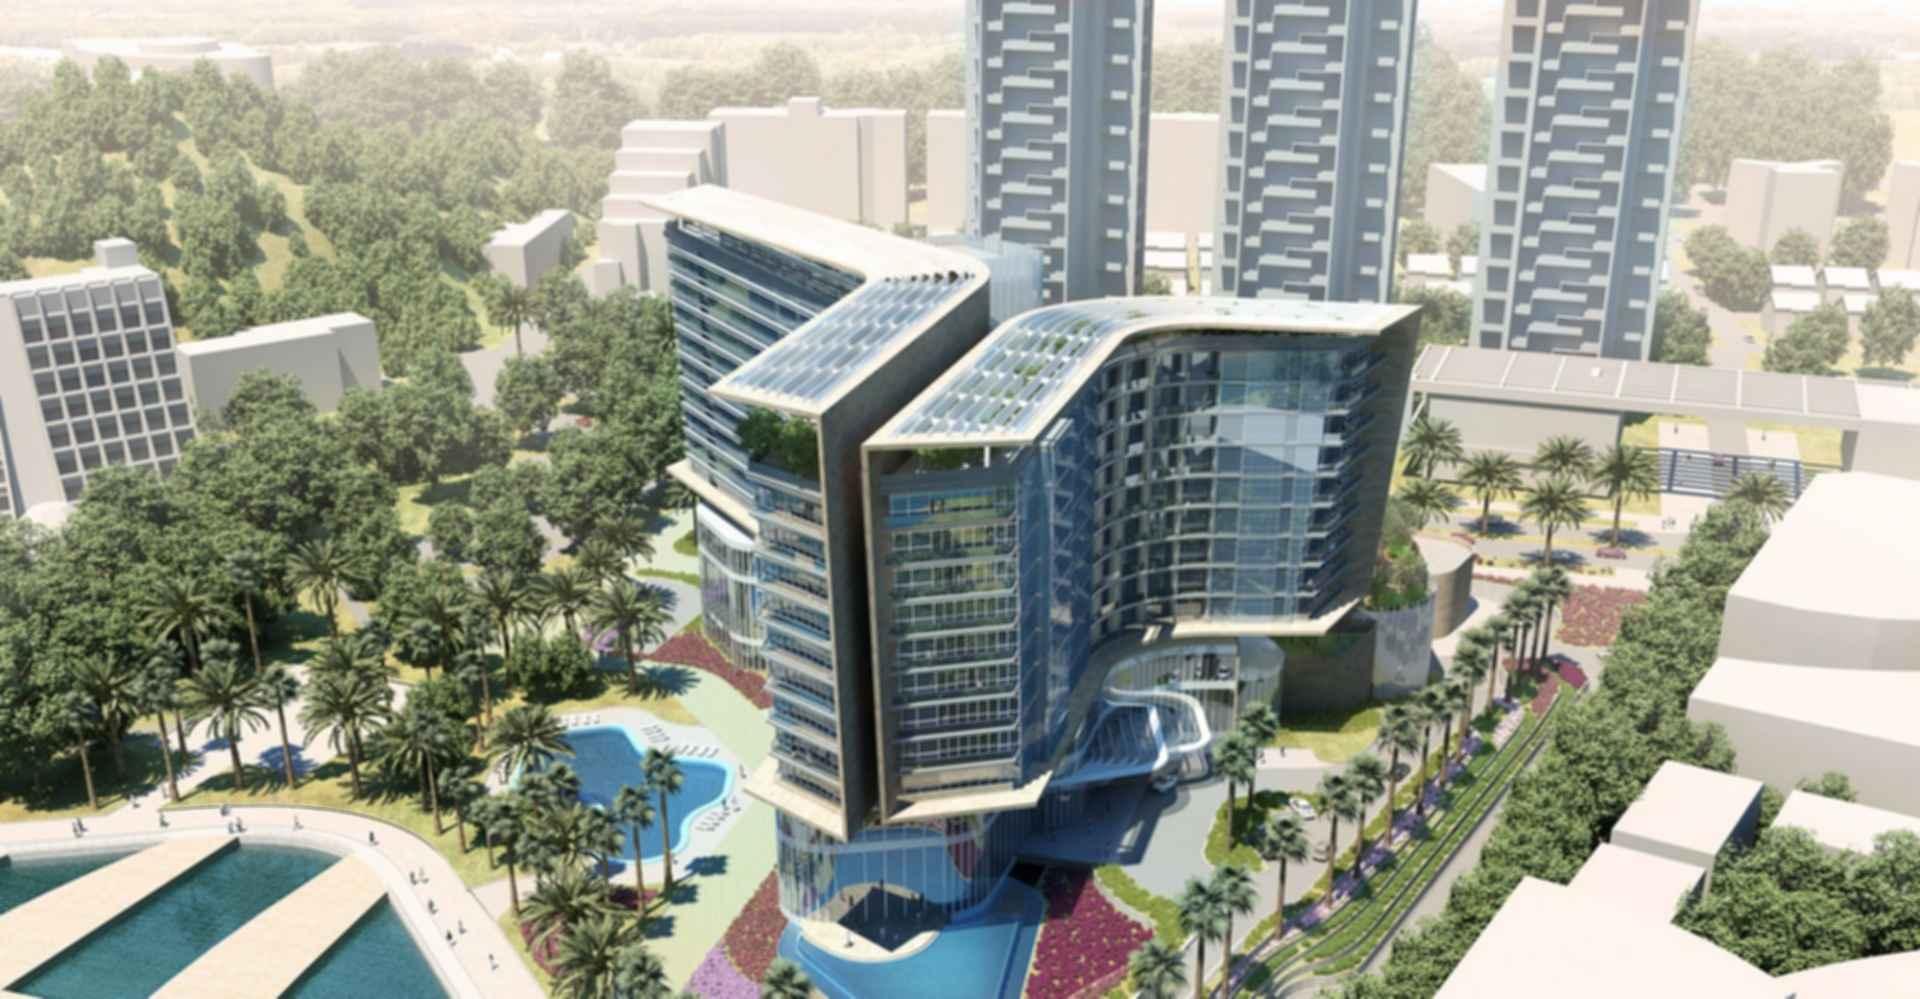 Hilton Shenzhen Marina Hotel - Concept Design